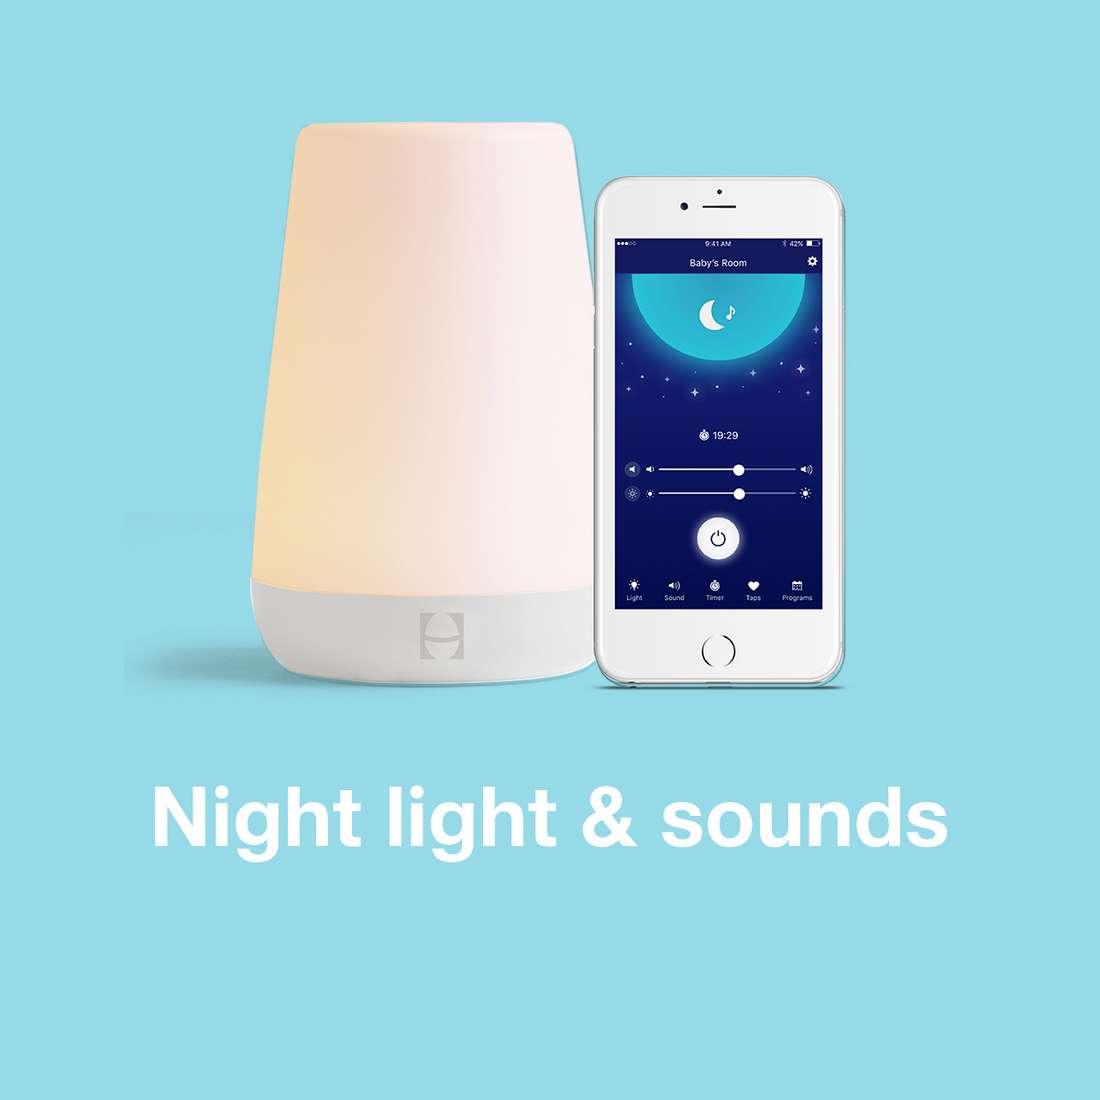 24 Timer Sound hatch rest sound machine, night light & time-to-rise : target